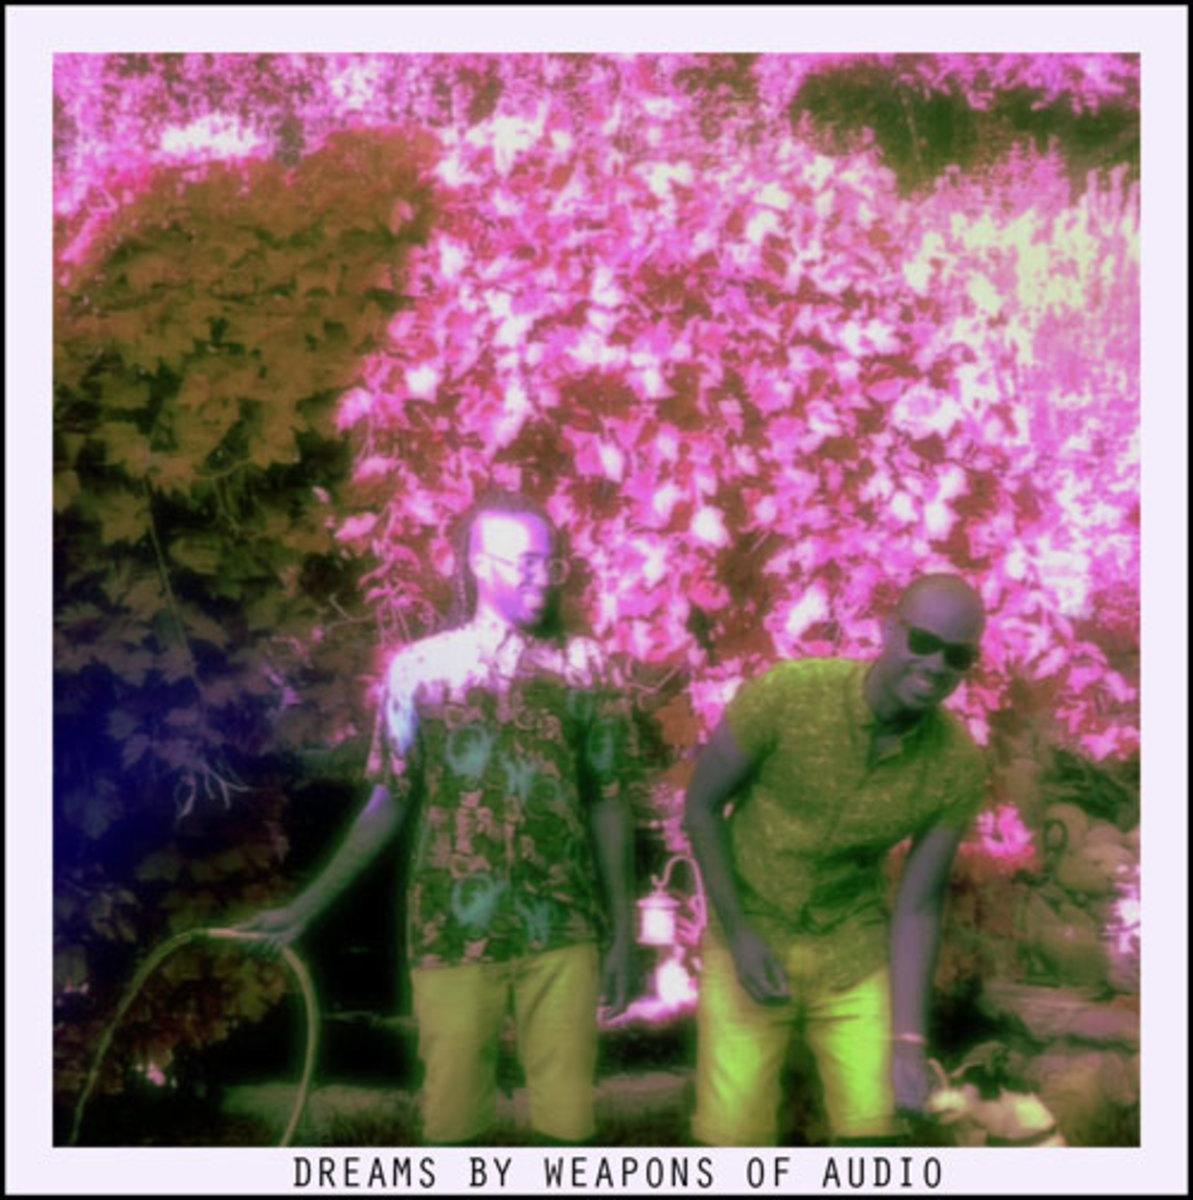 weaponsofaudio-dreams.jpg